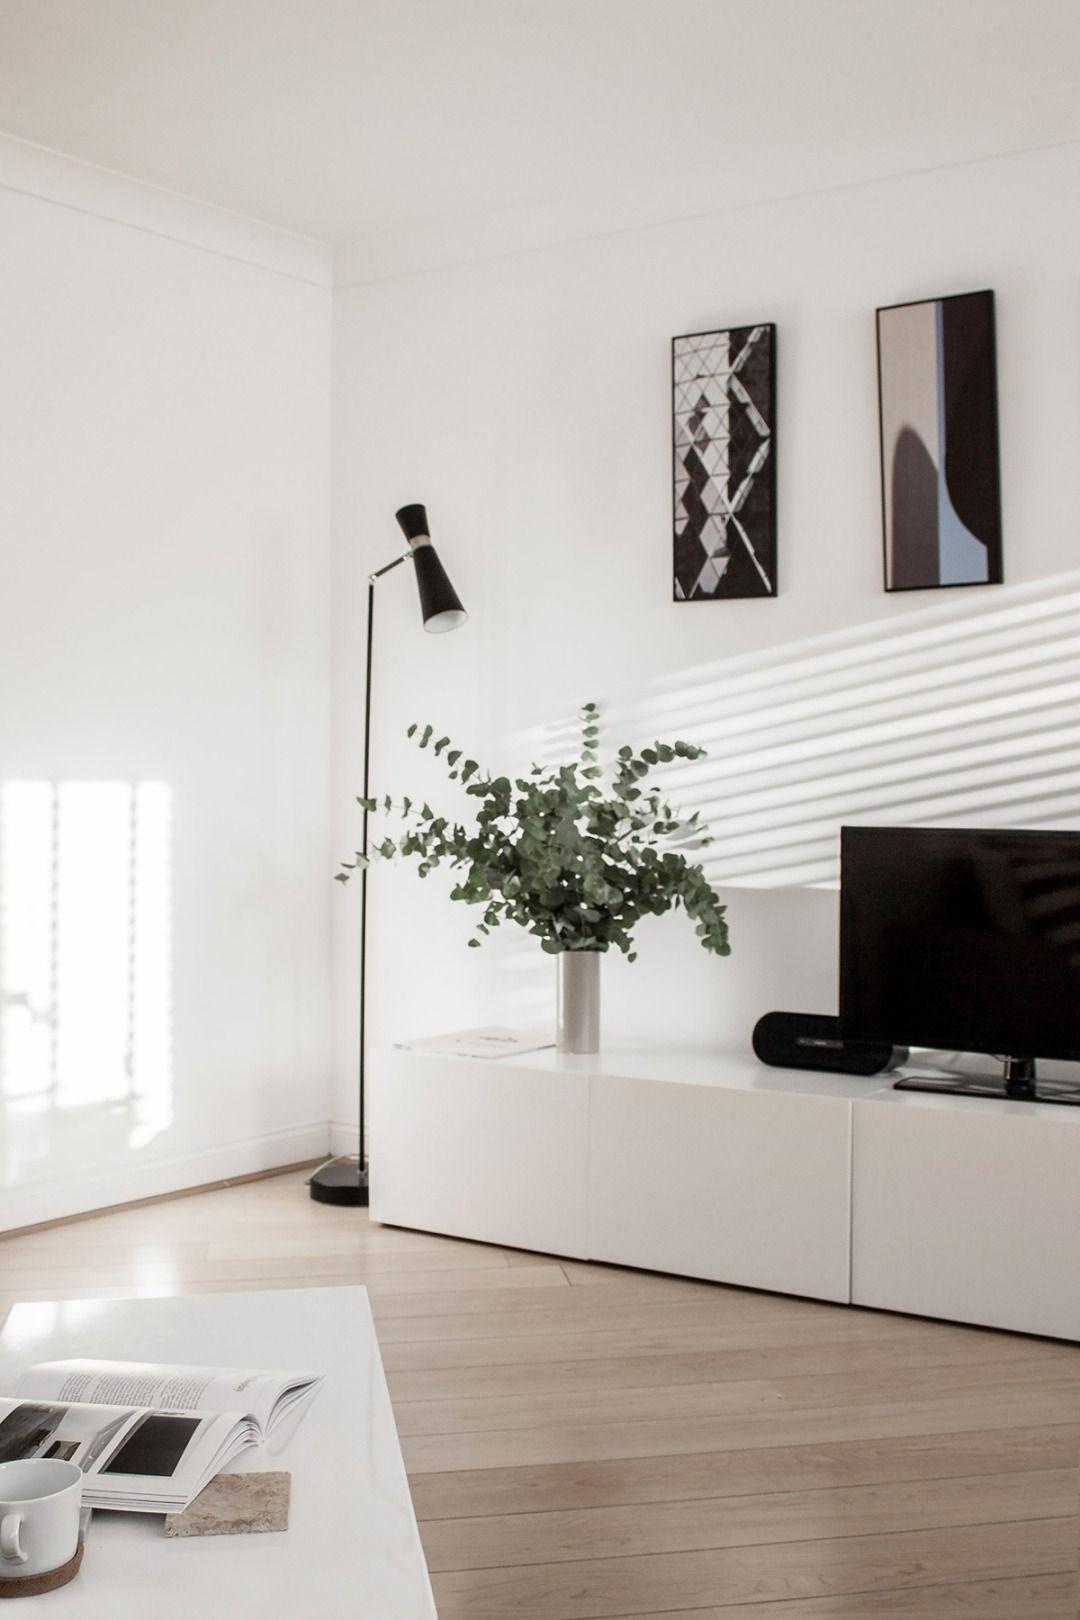 Ikea Tv Kast Bonde.An Architect S London Apartment Designed On A Dime Italian